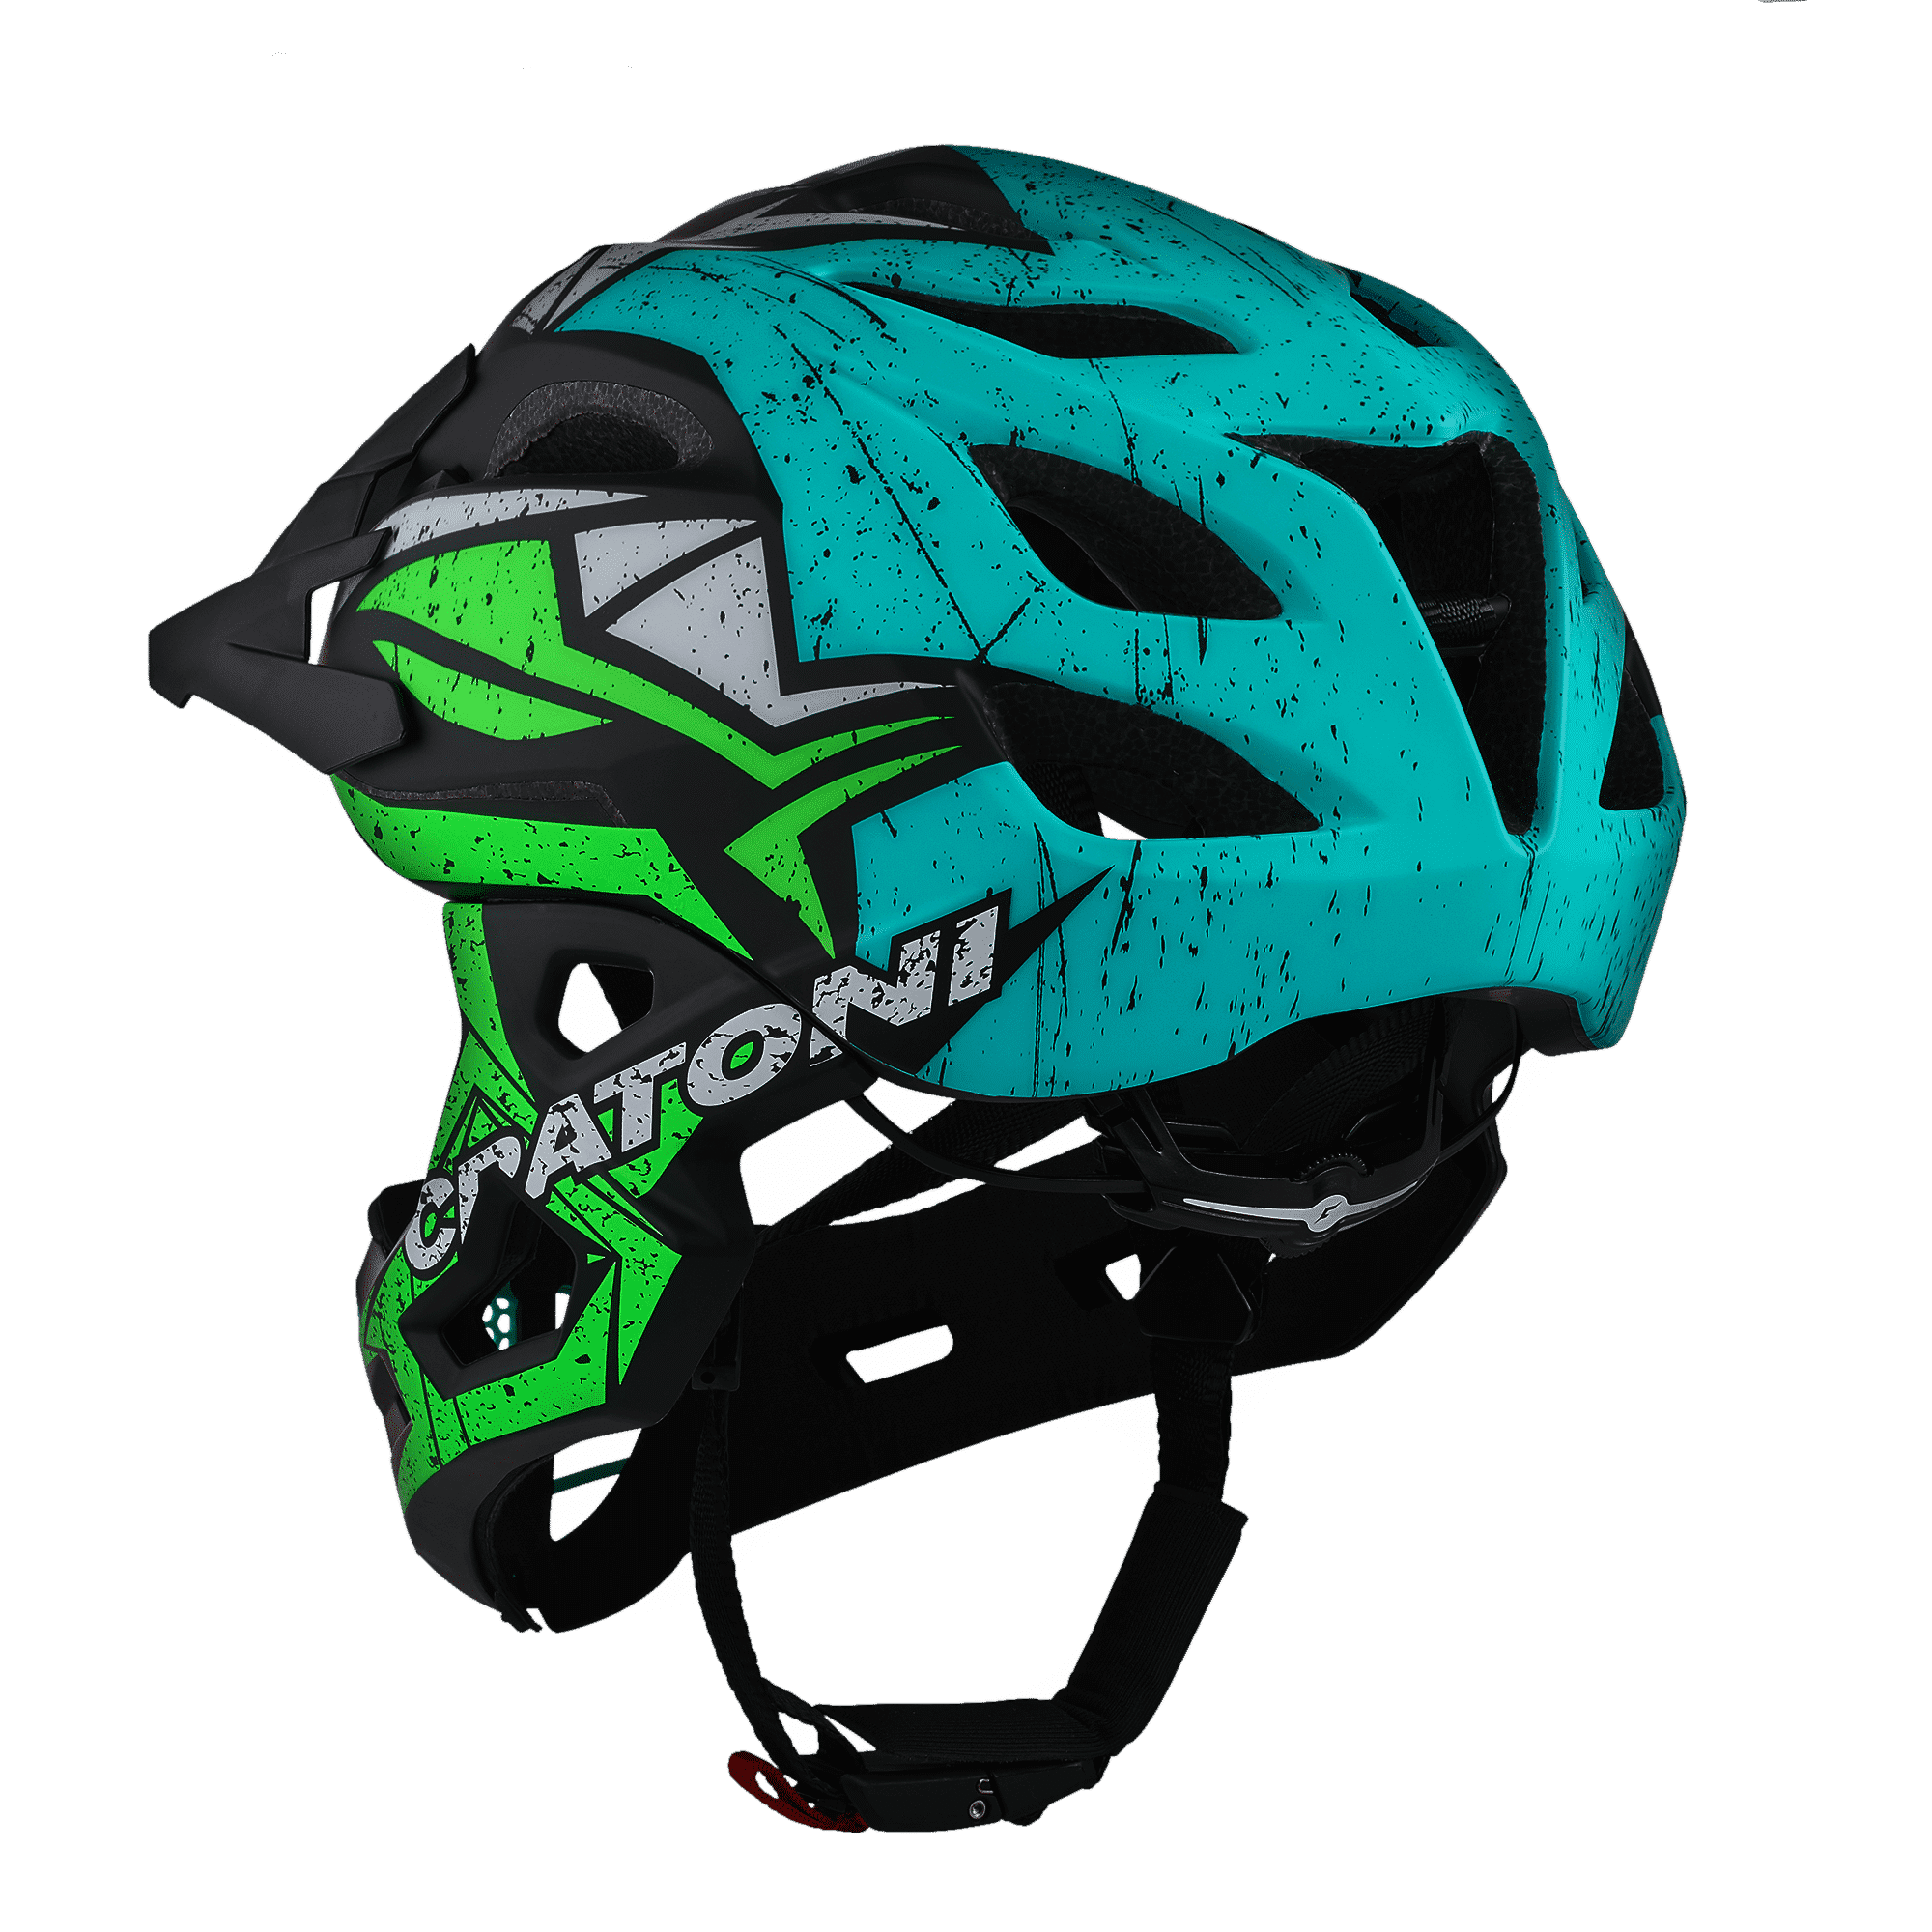 C-Maniac Pro Black Lime Turquoise Matt Rückansicht